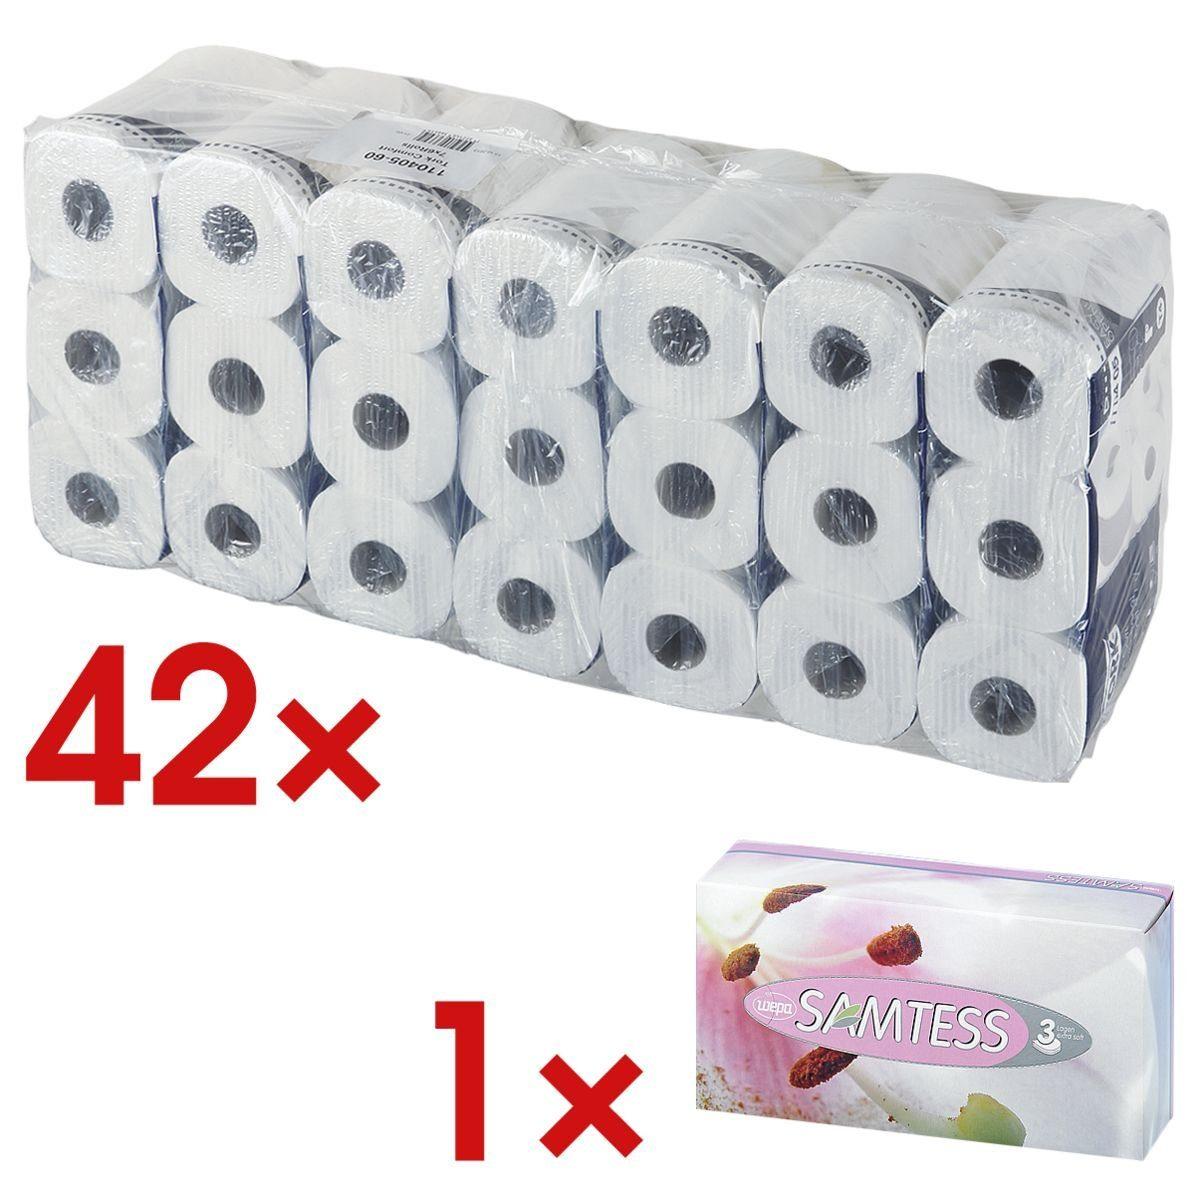 TORK Toilettenpapier 4-lagig - 42 Rollen inkl. Kosmetiktücher »Premium« 1 Set